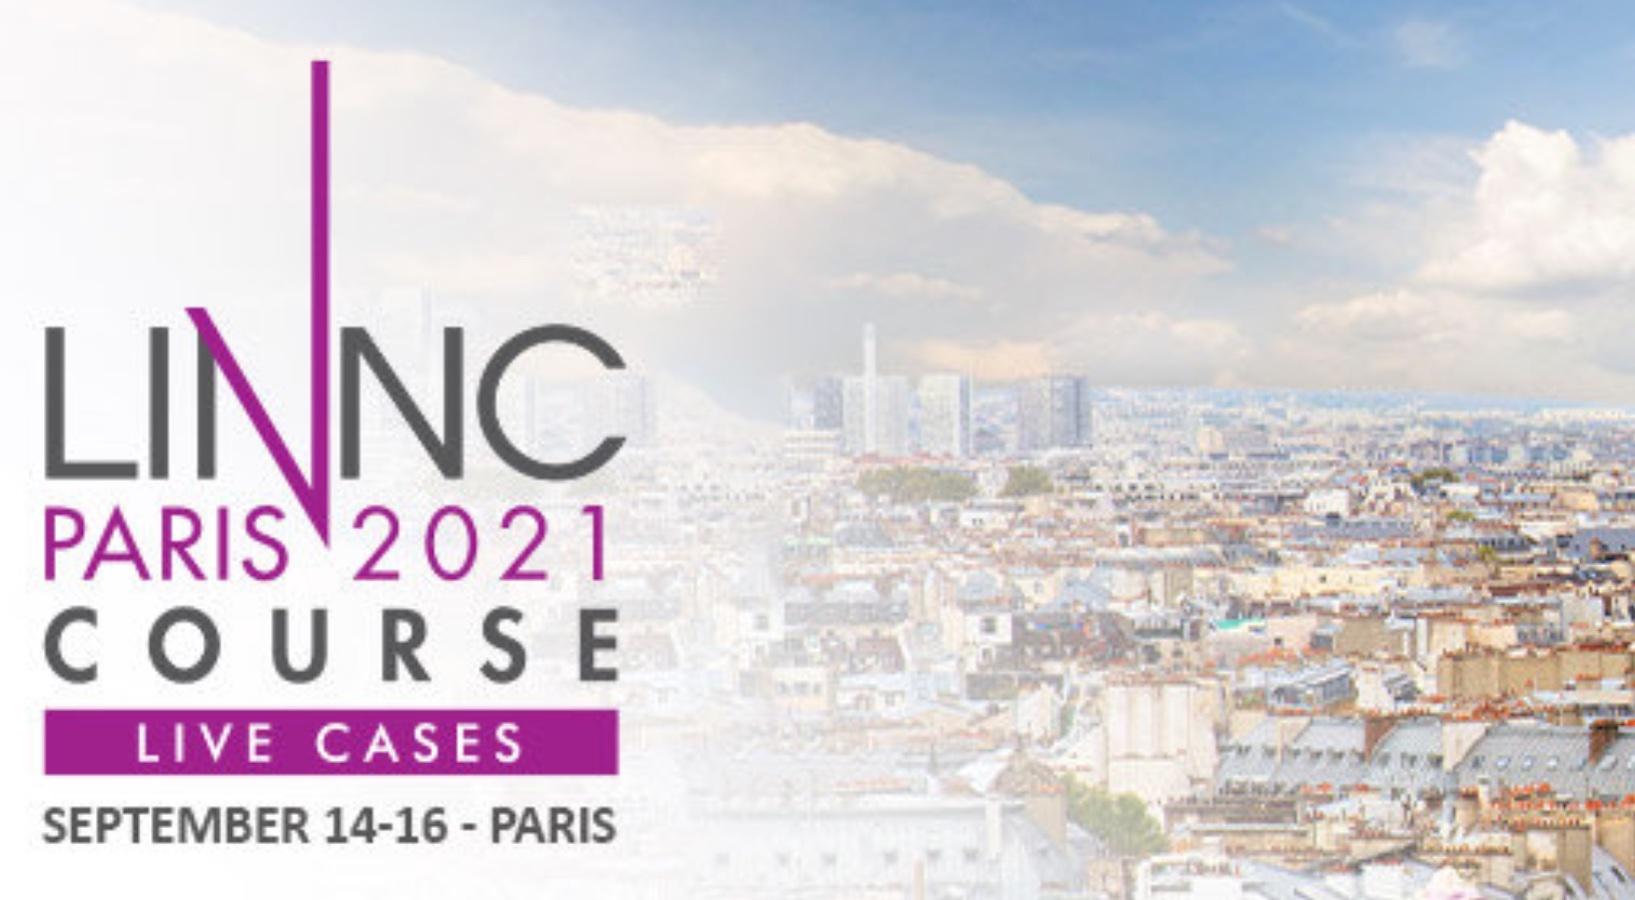 LINNC 2021